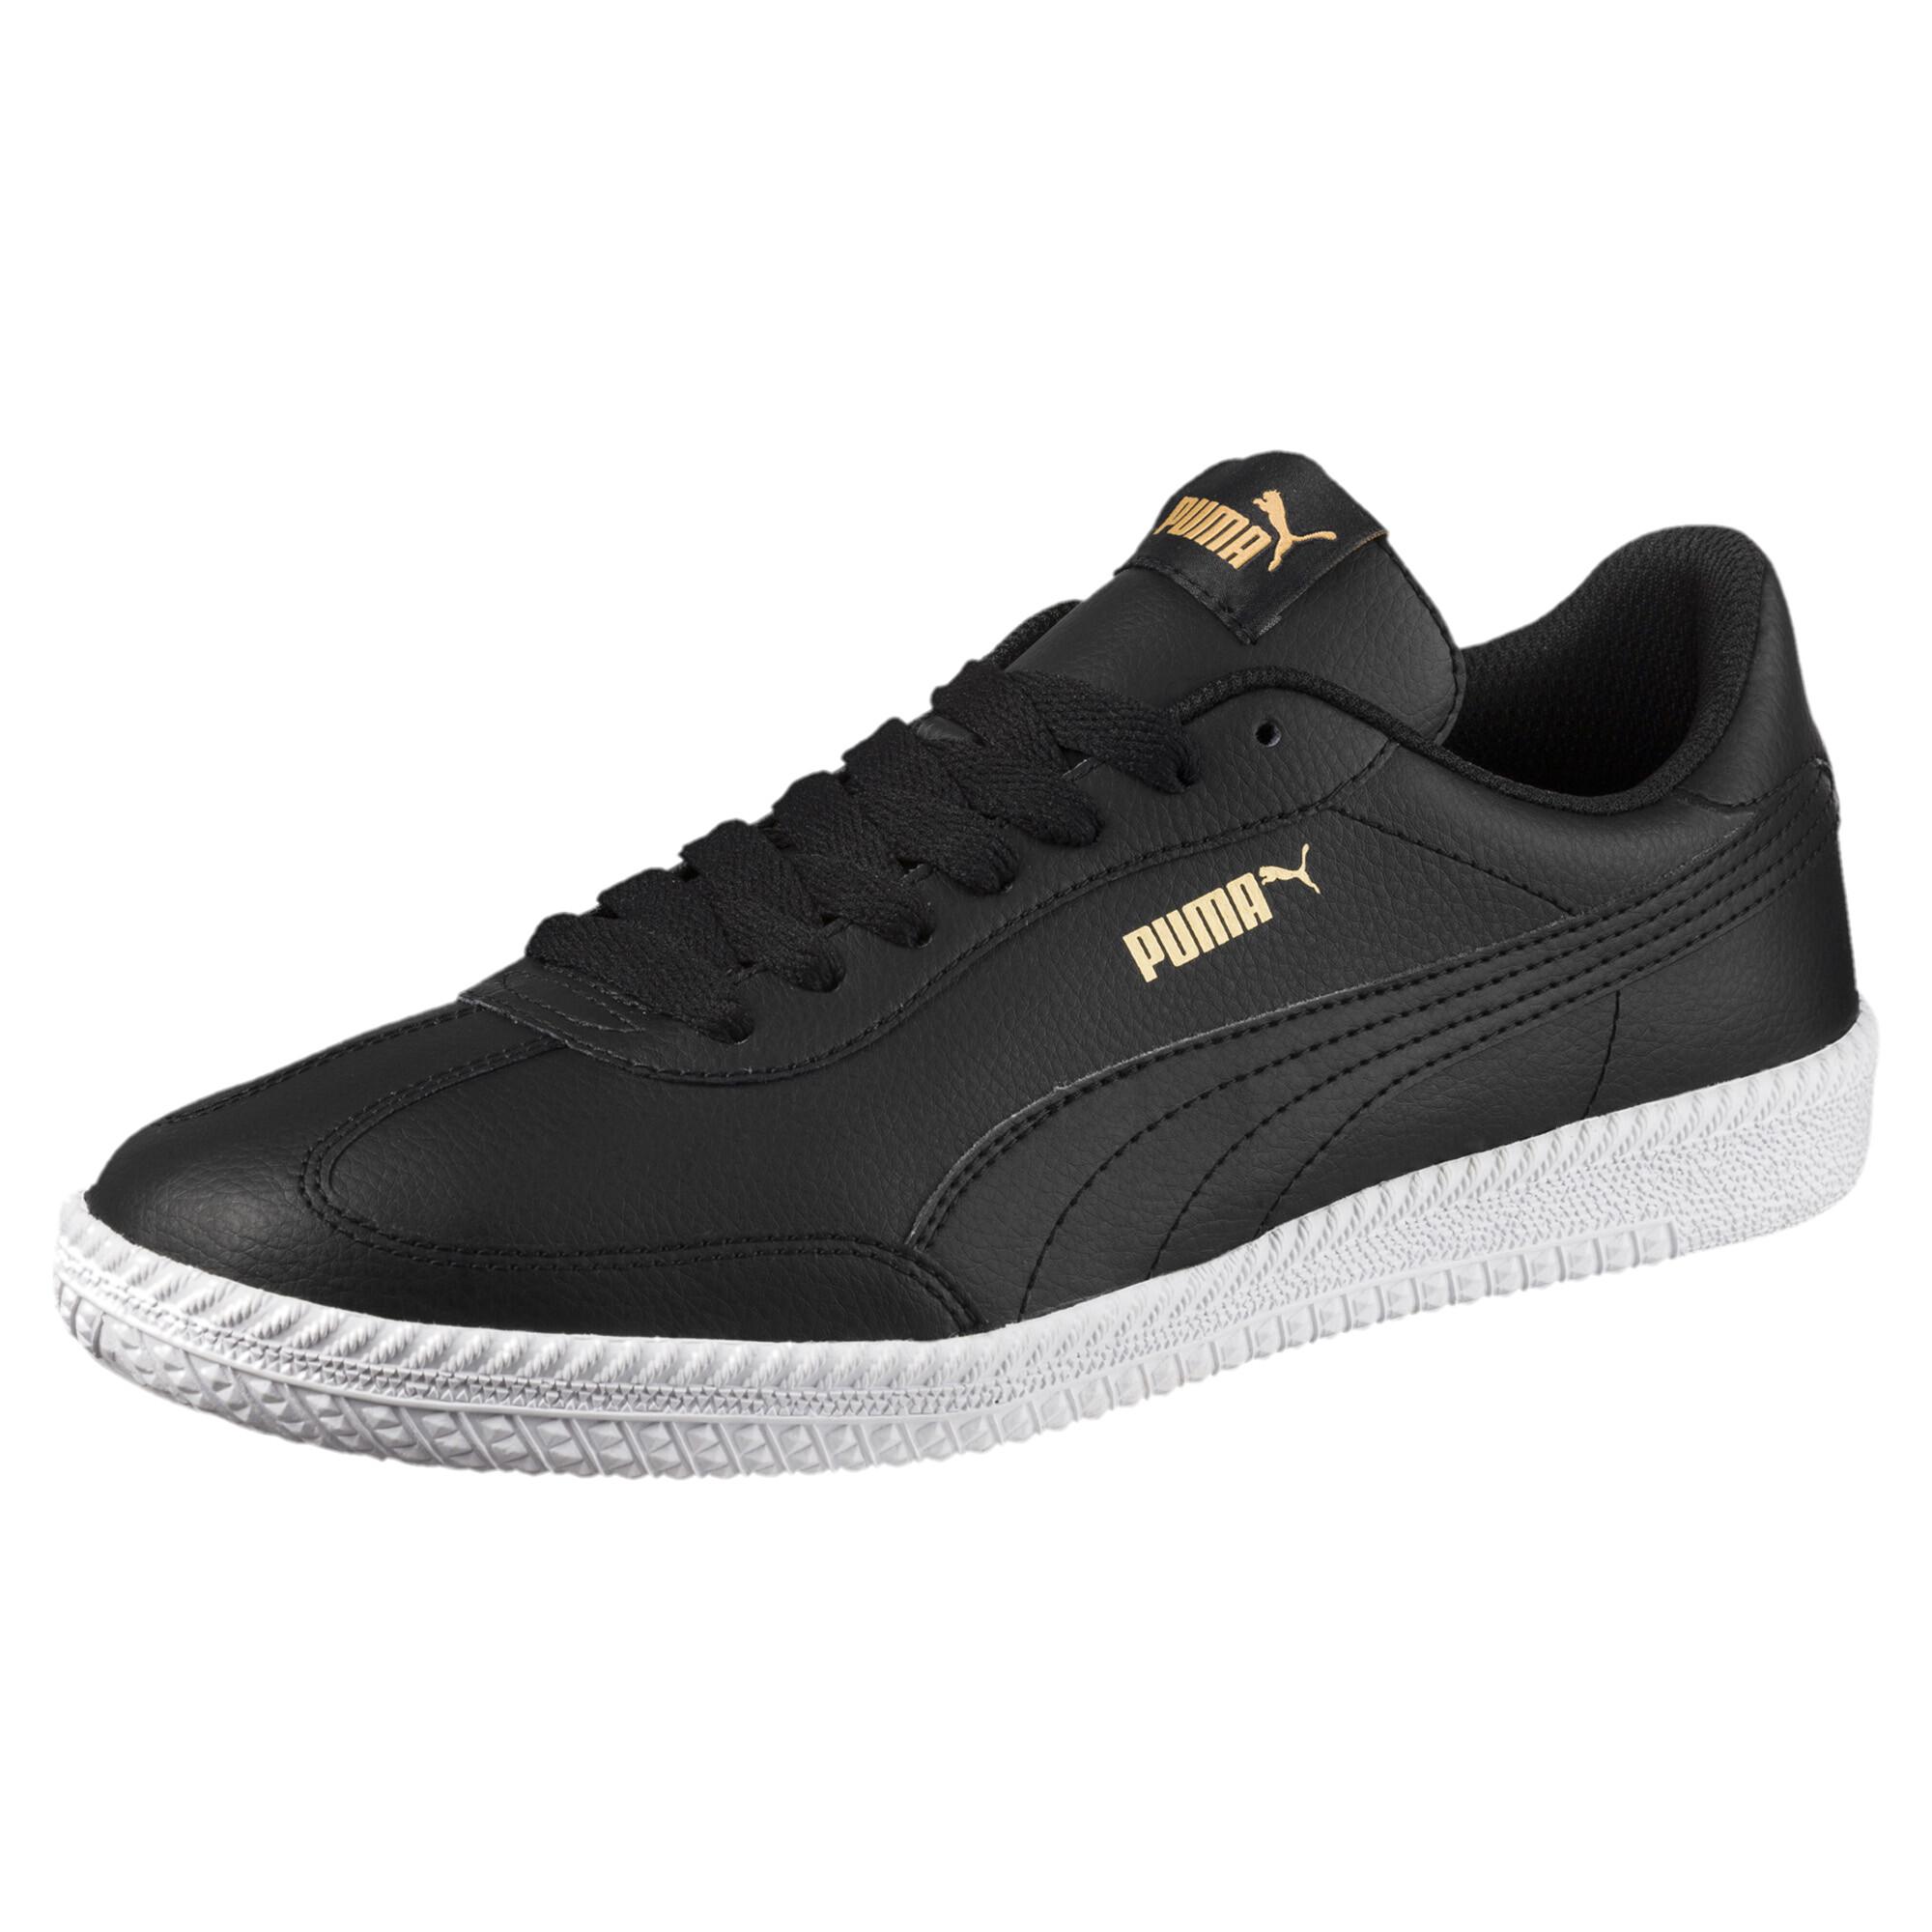 PUMA-Astro-Cup-Leather-Trainers-Men-Shoe-Basics thumbnail 9